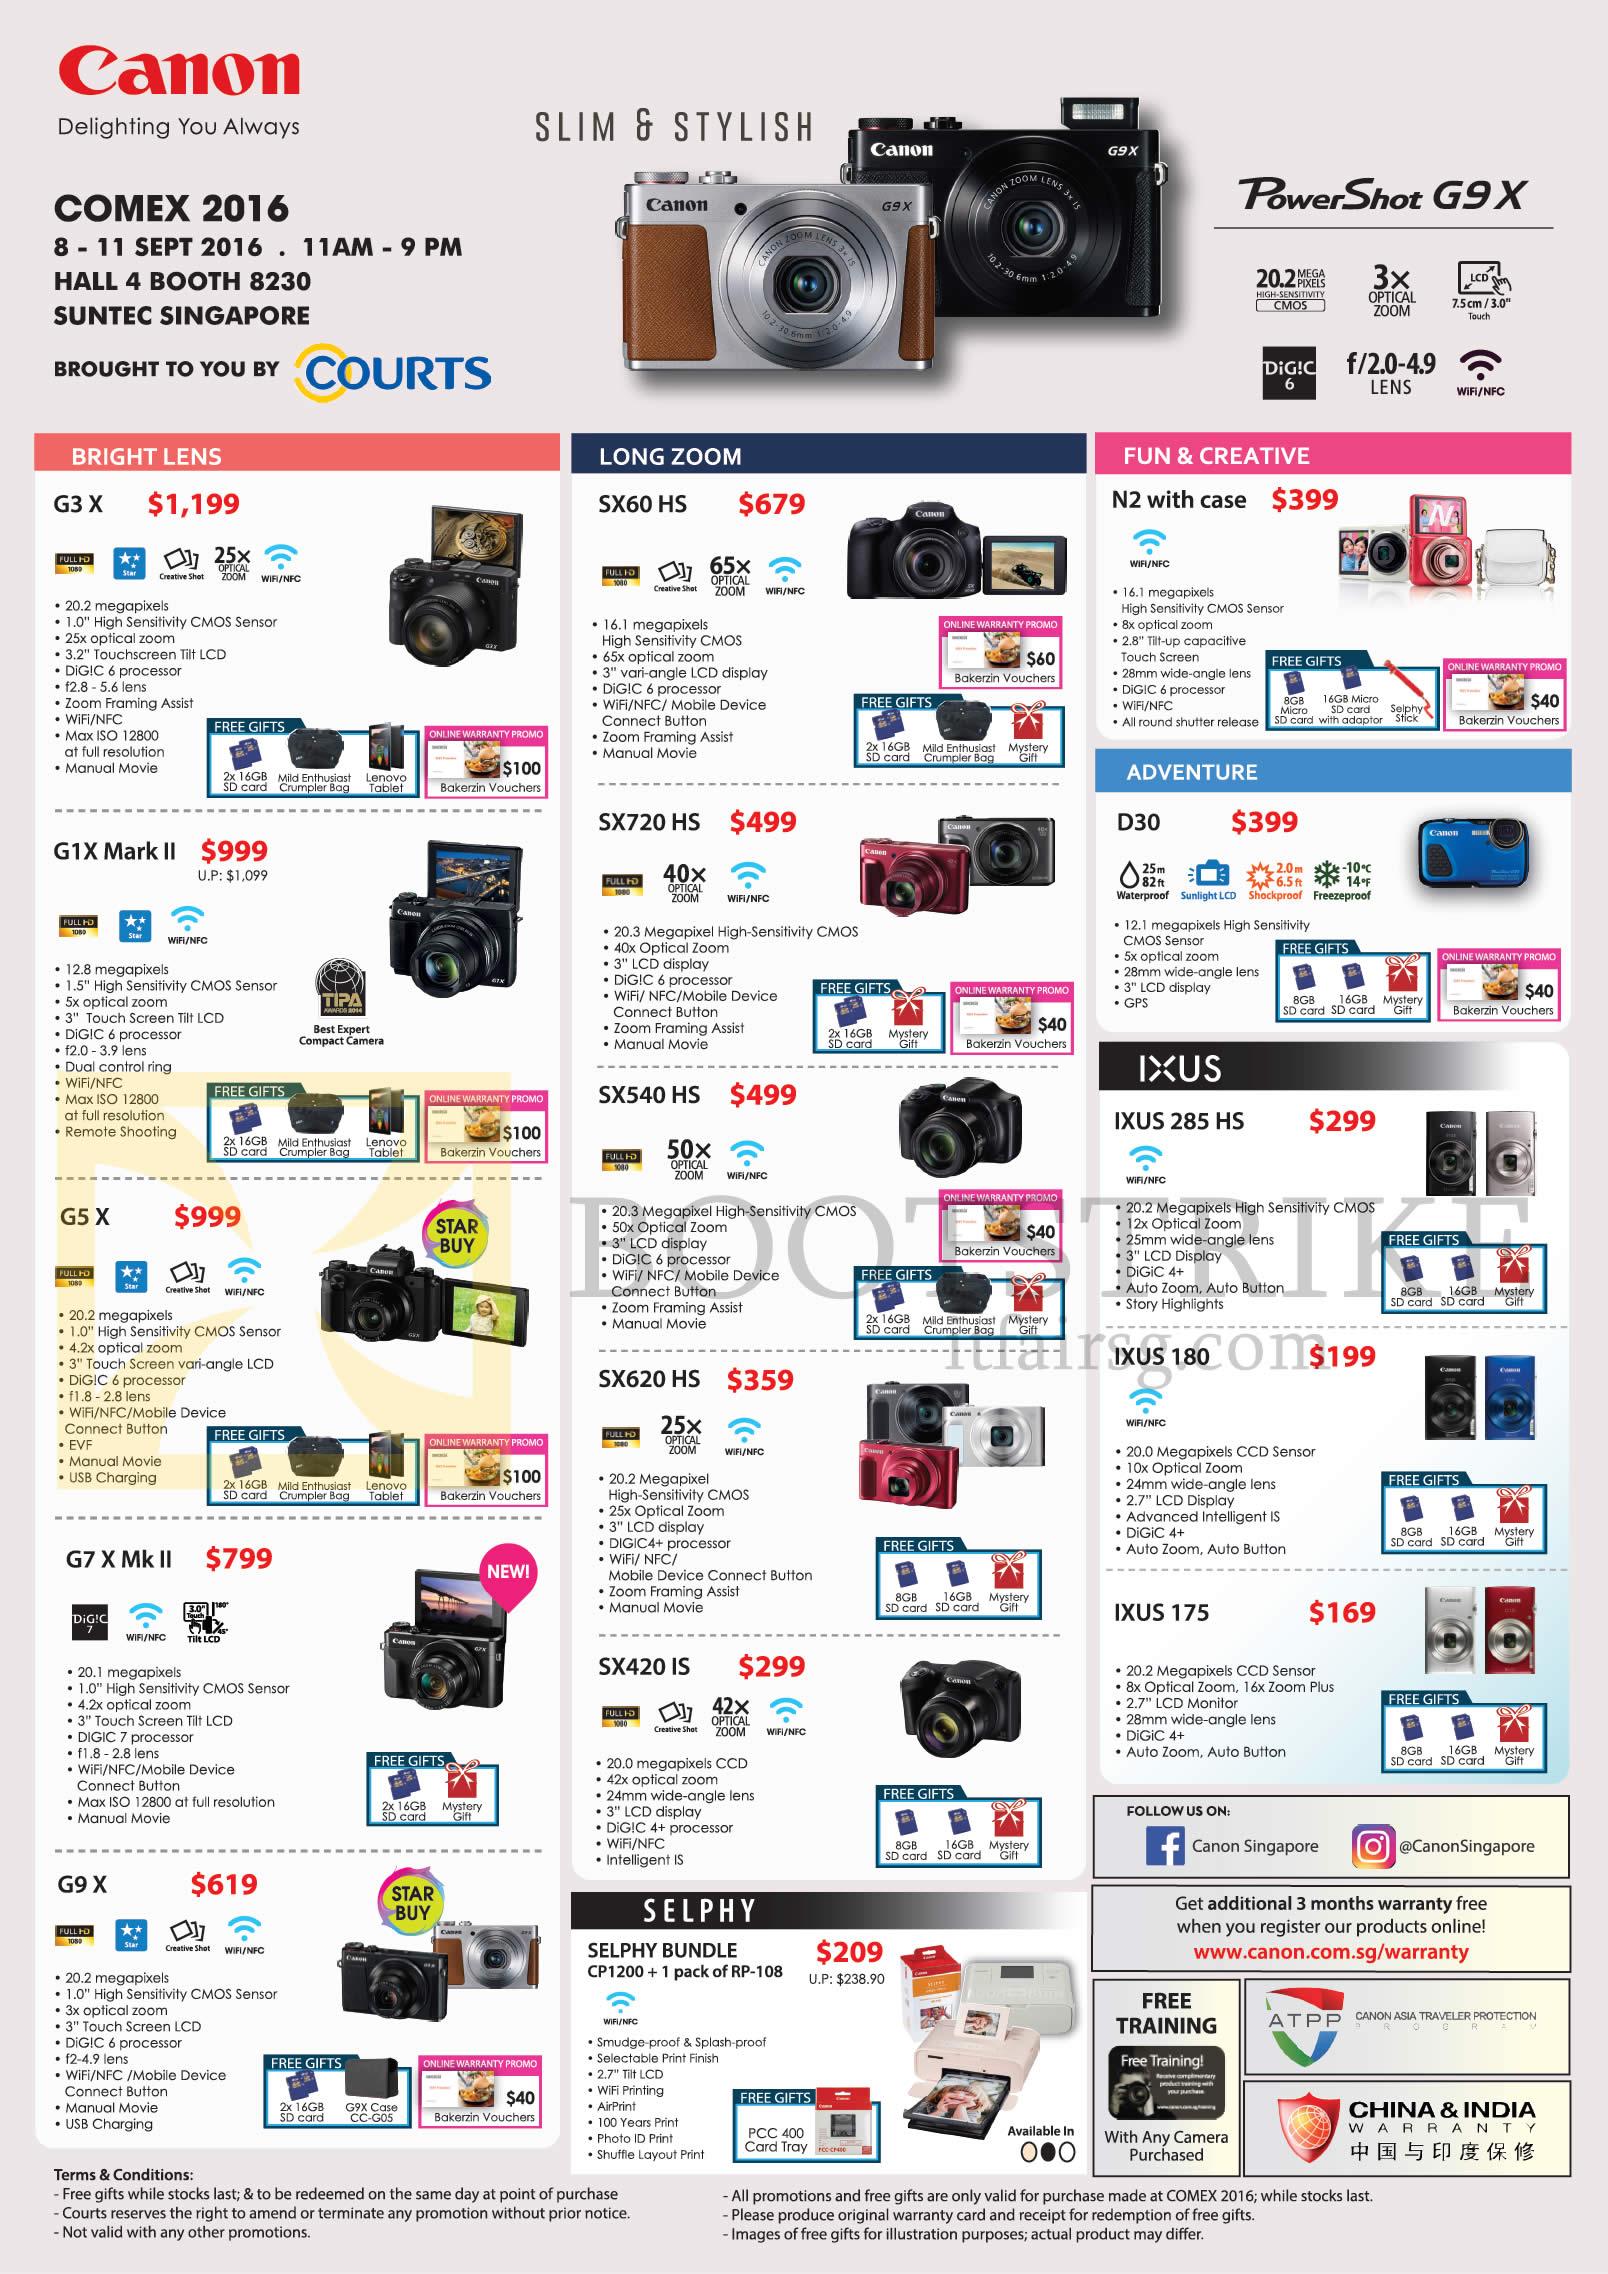 COMEX 2016 price list image brochure of Canon Digital Cameras, Printers, G3 X, G1X Mark II, G5X, G7X Mk II, G9X, SX60 HS, SX720 HS, SX540 HS, SX620 HS, SX420 IS, N2, D30, IXUS 285 HS, 180, 175, Selphy